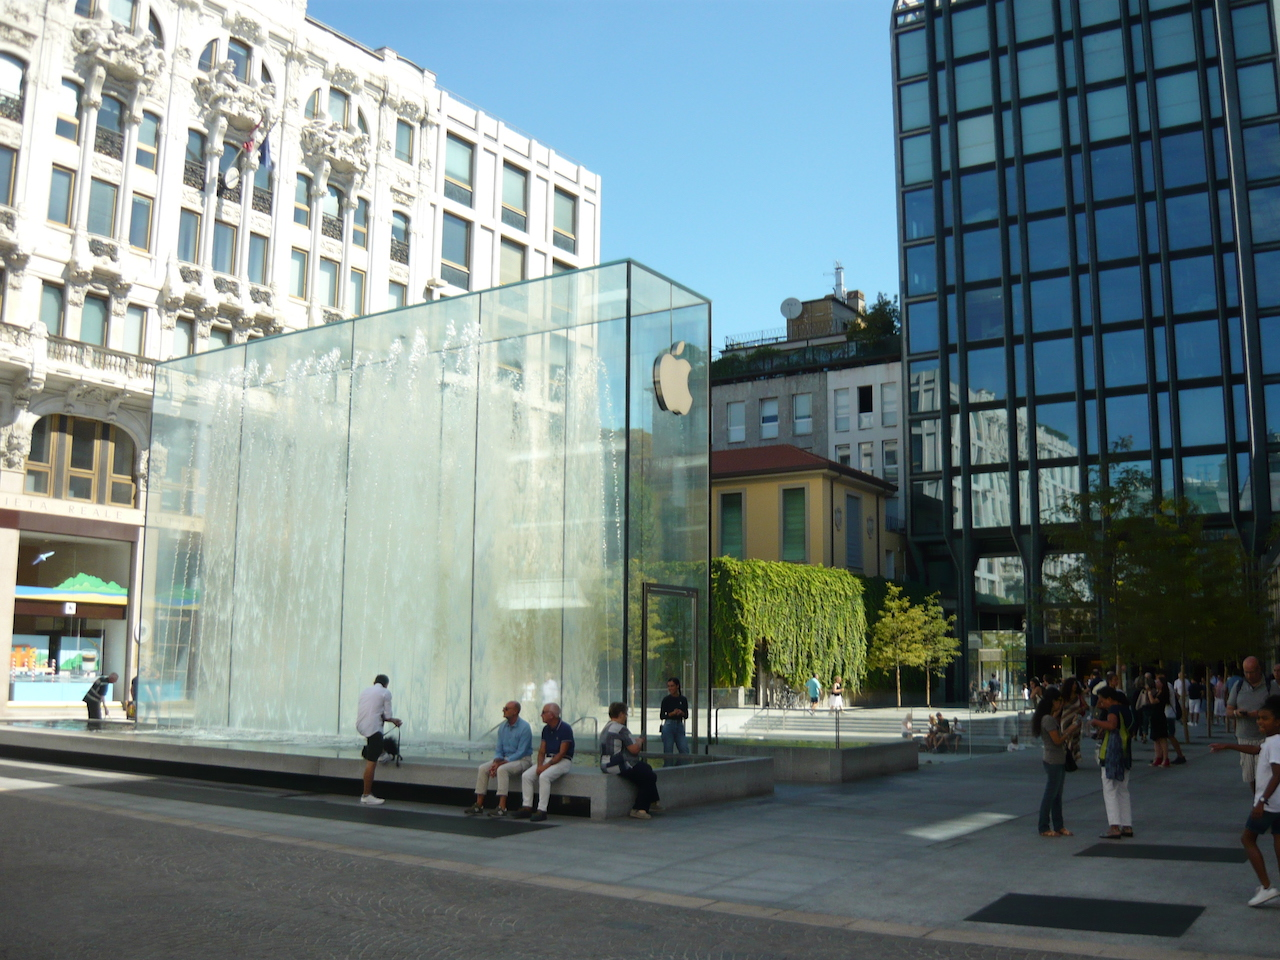 Apple store milano la mela sbarca a due passi dal duomo for Milano shop